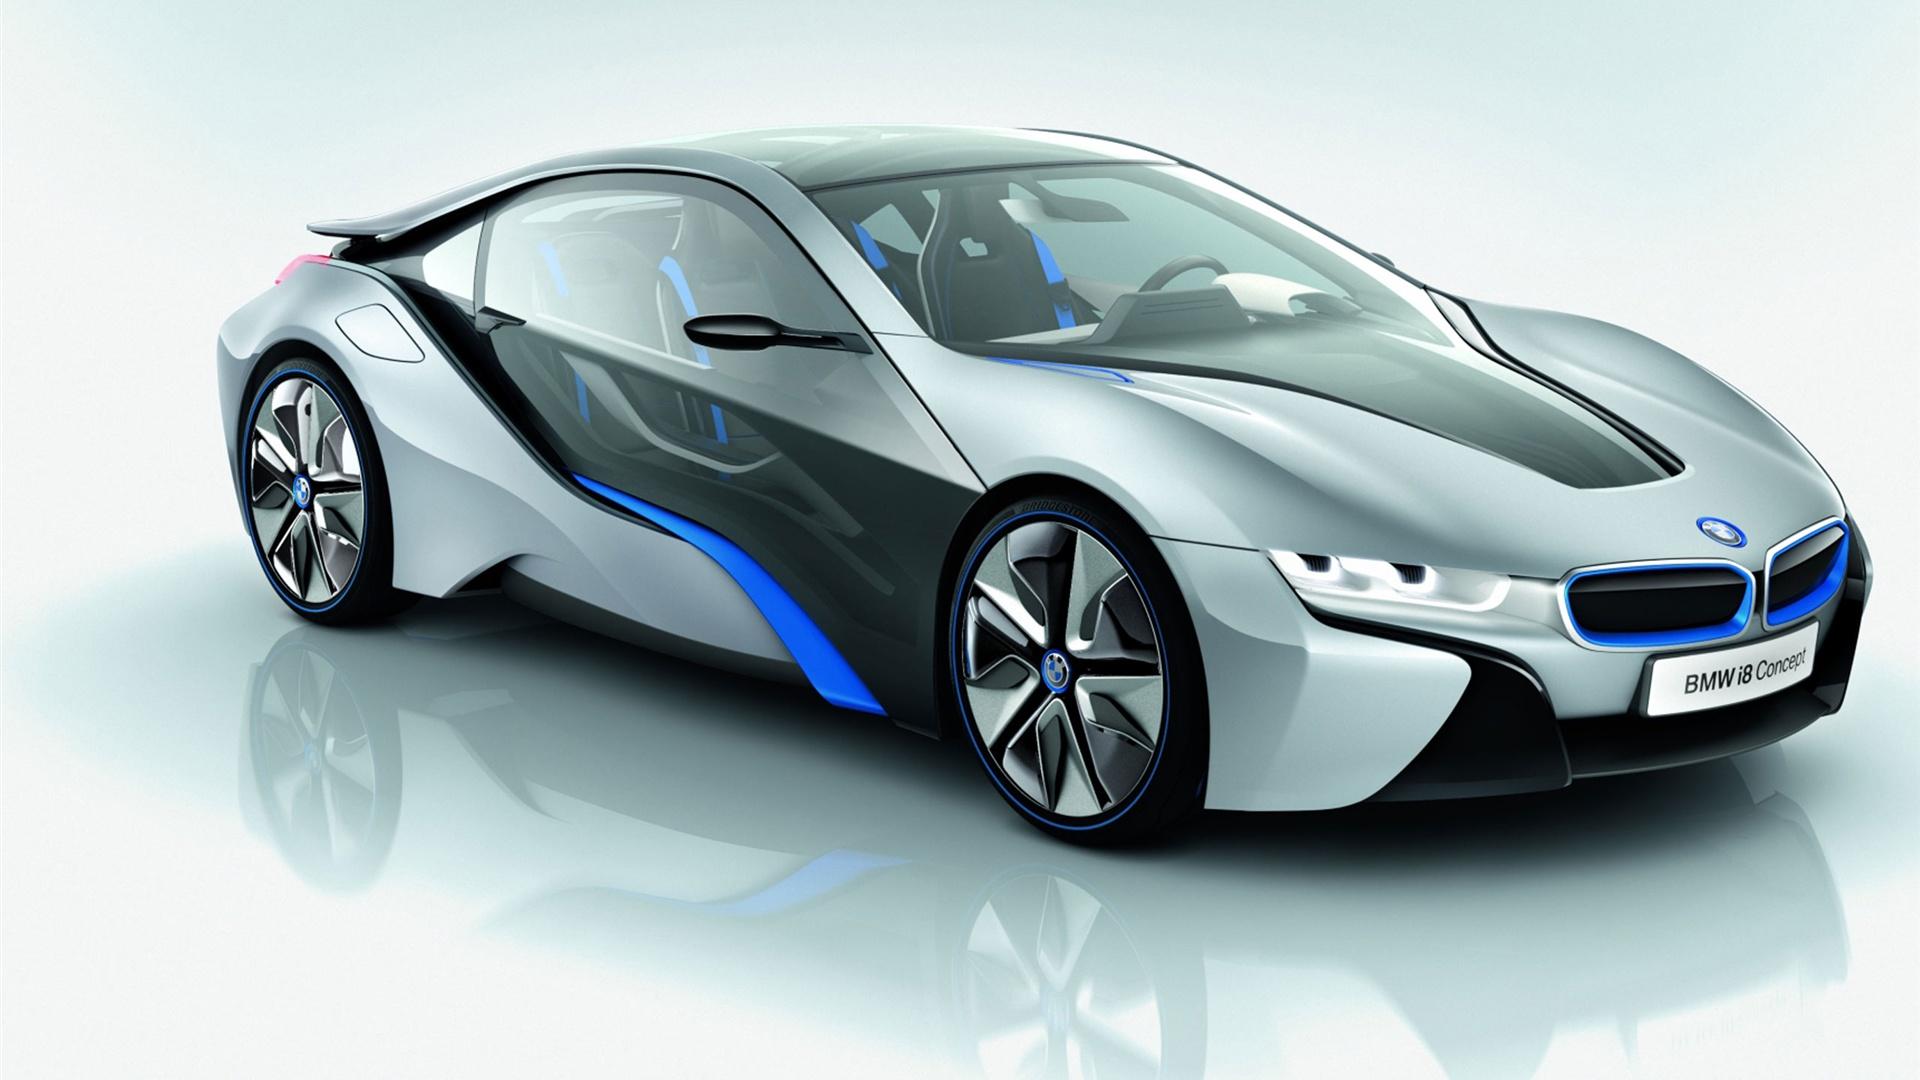 Bmw I8 Concept Car 2560x1600 Hd Hintergrundbilder Hd Bild